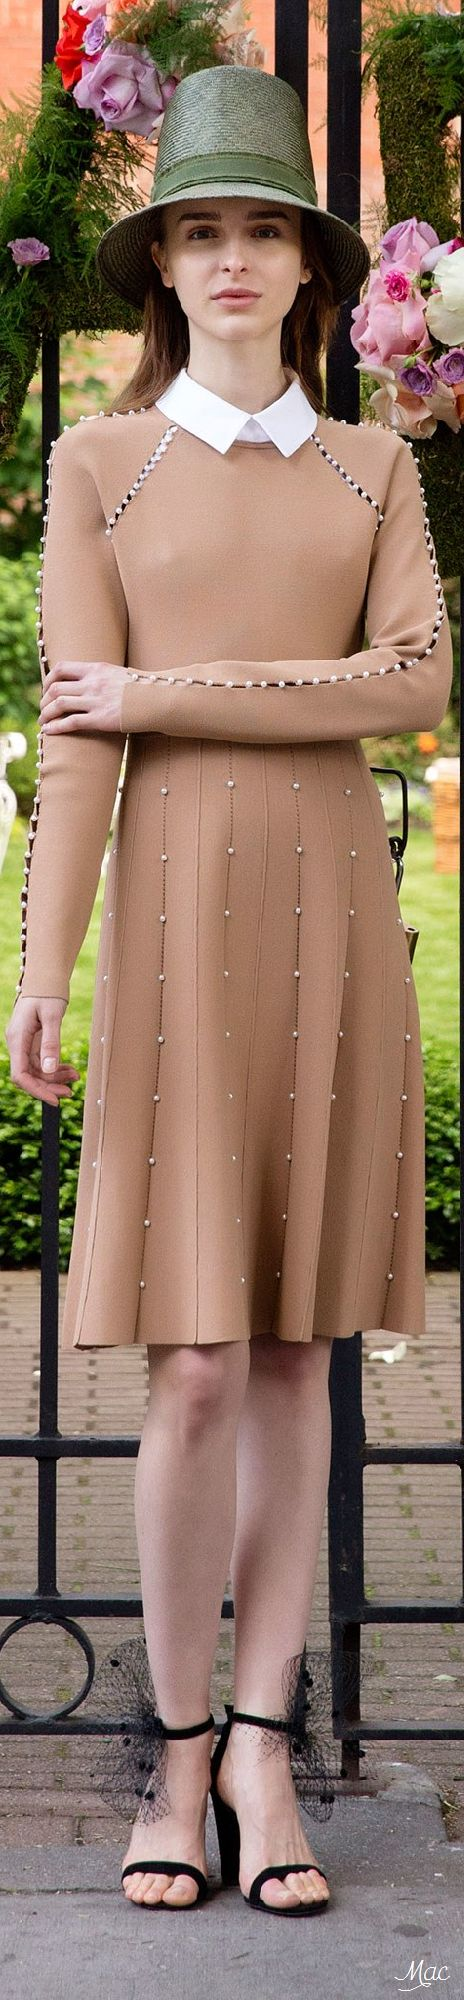 J crew blue lace dress march 2019  best Платья images on Pinterest  Fashion details Blouses and